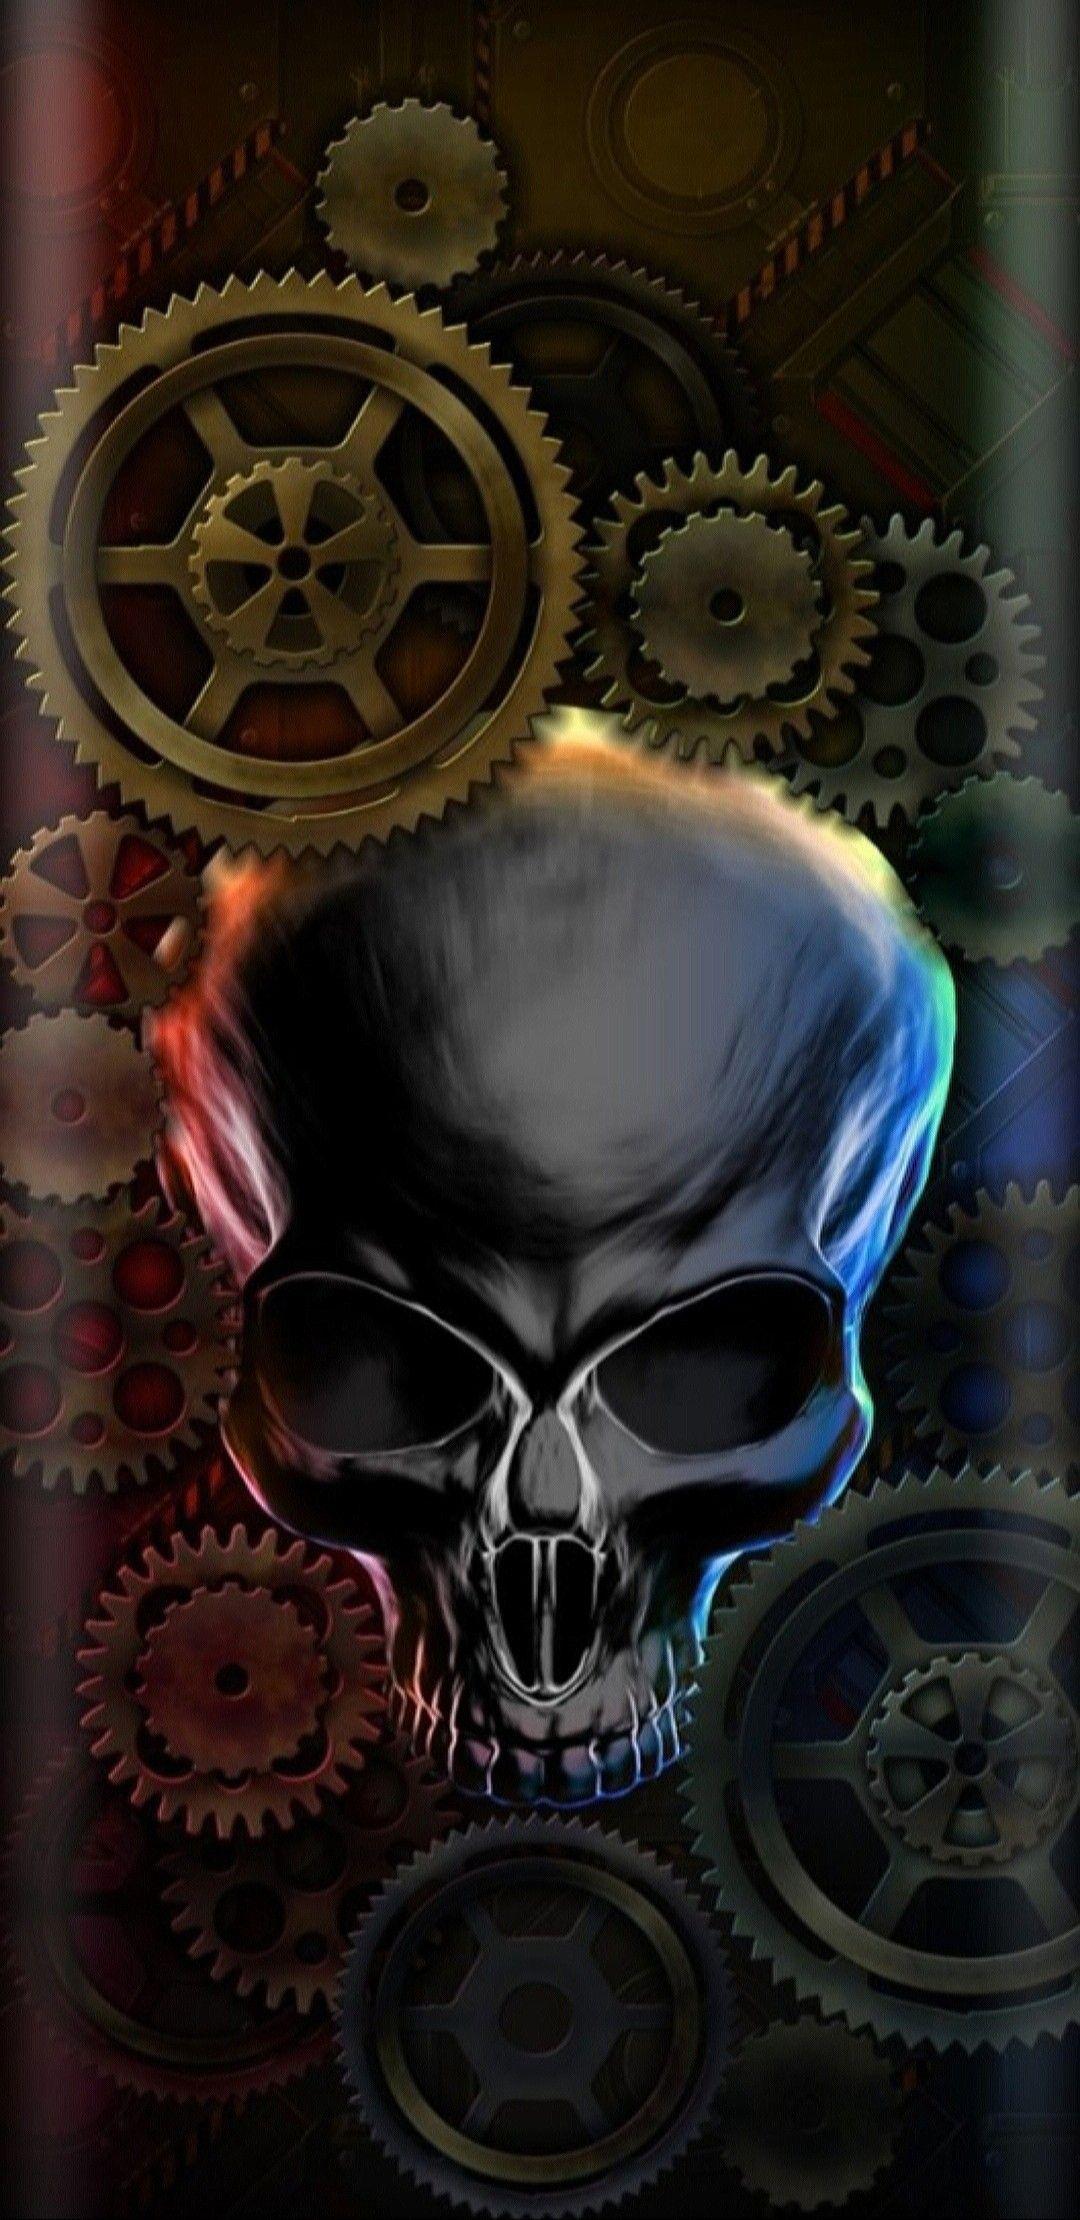 Pin By Nikkladesigns On Skull Skeleton Wallpaper Skeleton Wallpaper Dont Touch My Phone Wallpapers Skull Pattern